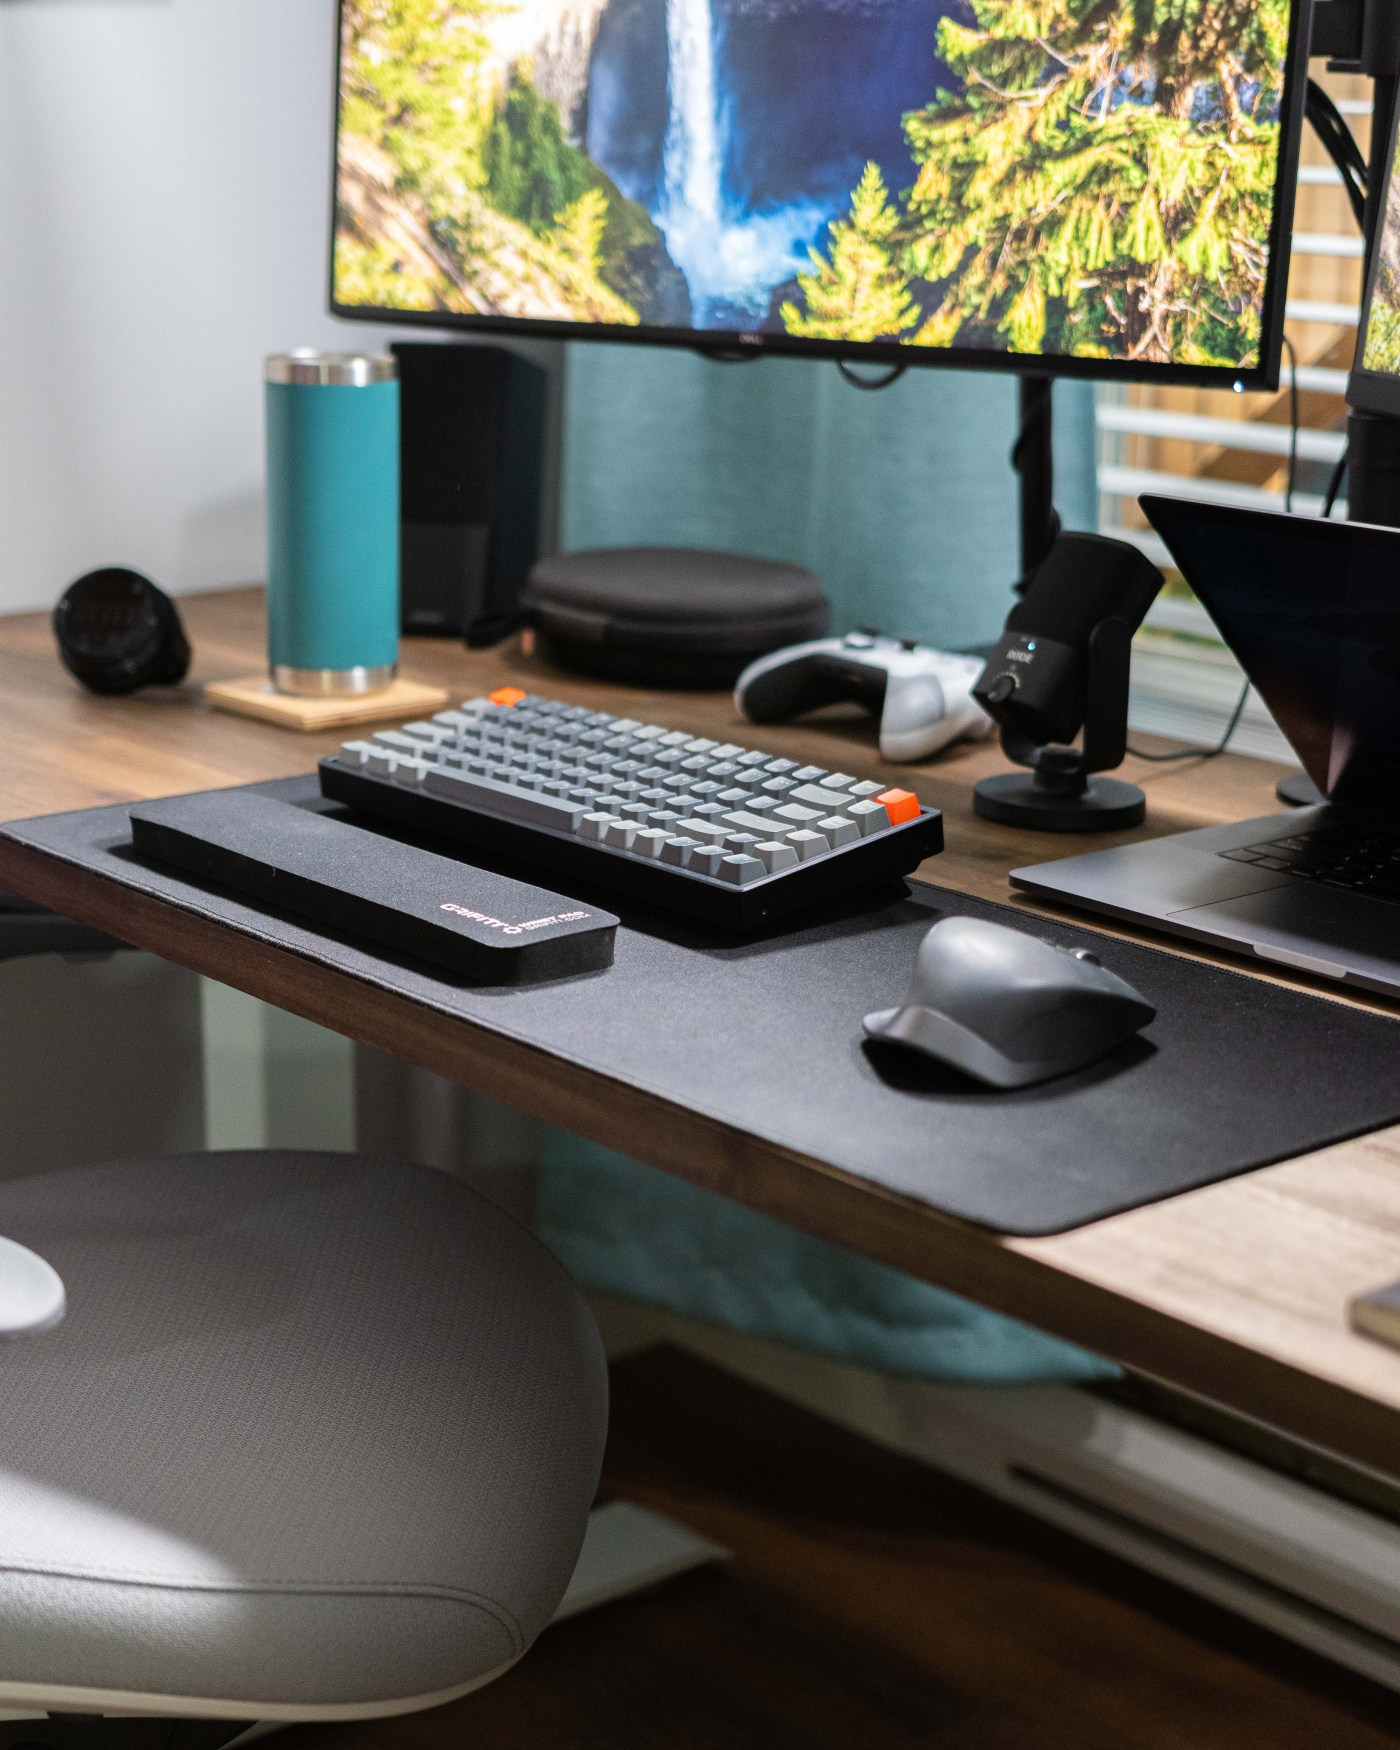 Keychron K2 keyboard, RØDE NT-USB-Mini microphone, Logitech MX Master 2S mouse